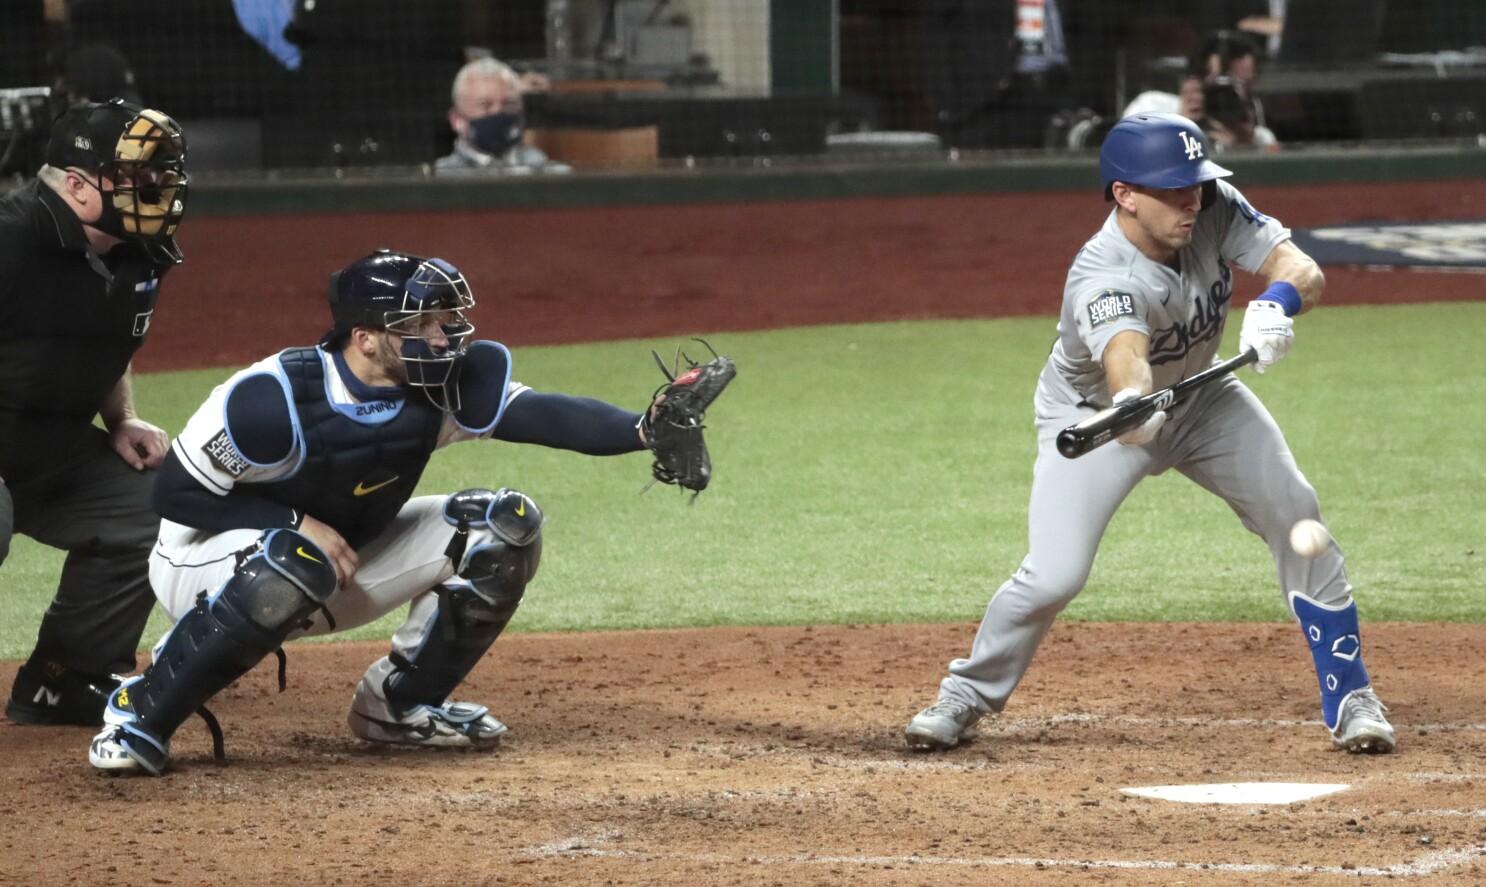 Dodgers' Austin Barnes equals World Series bunt, homer feat - Los Angeles  Times